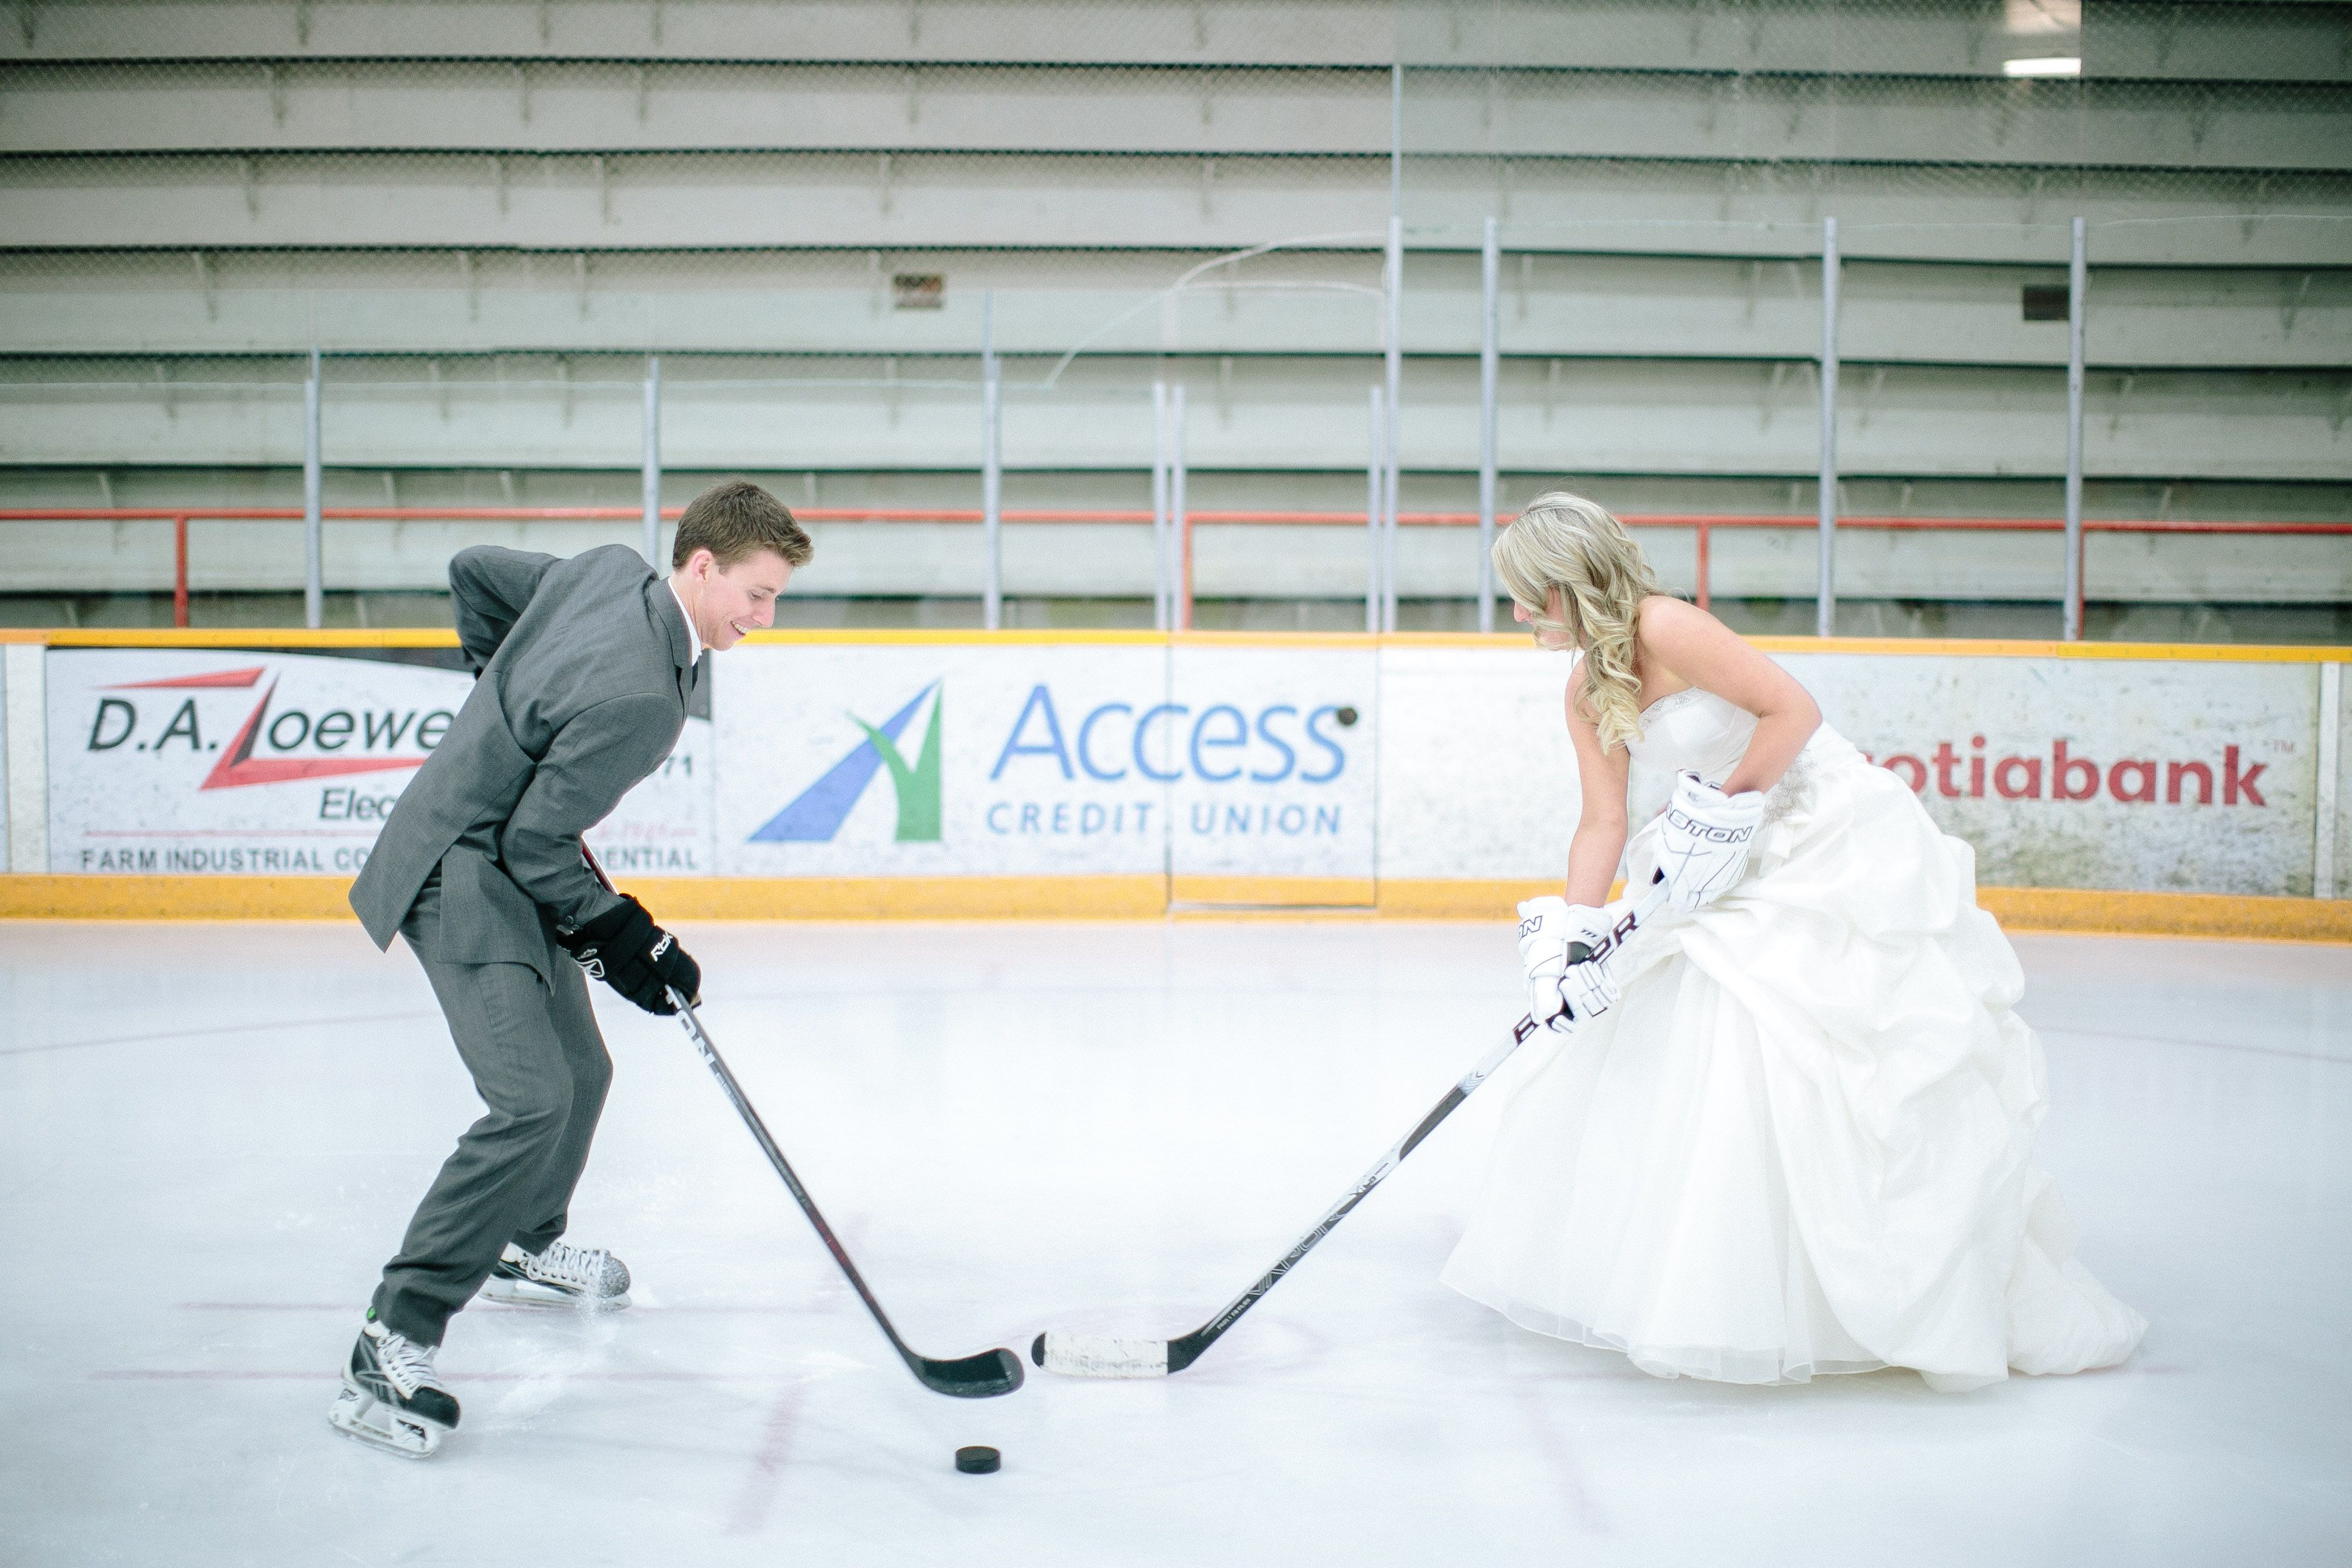 hockey wedding photography   ☆Everything HOCKEY☆   Pinterest ...